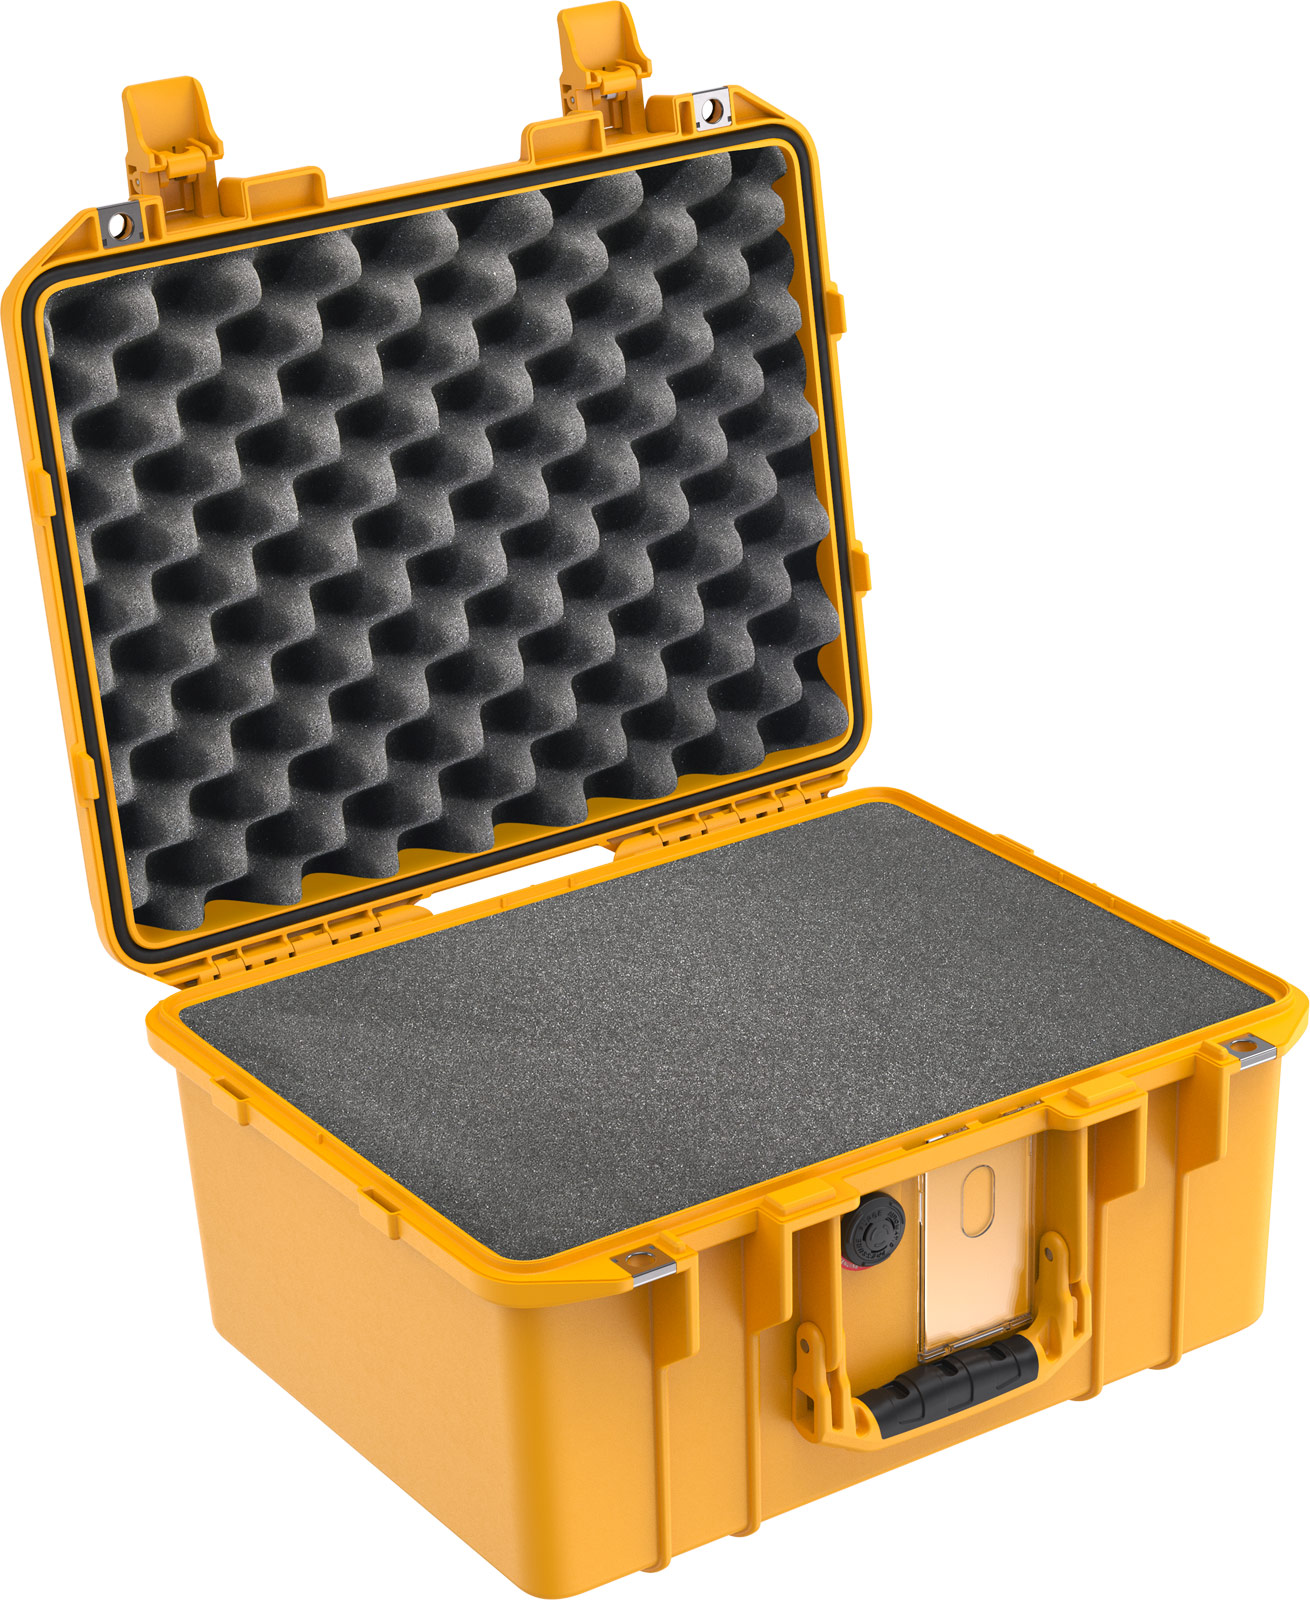 pelican air 1507 yellow foam case